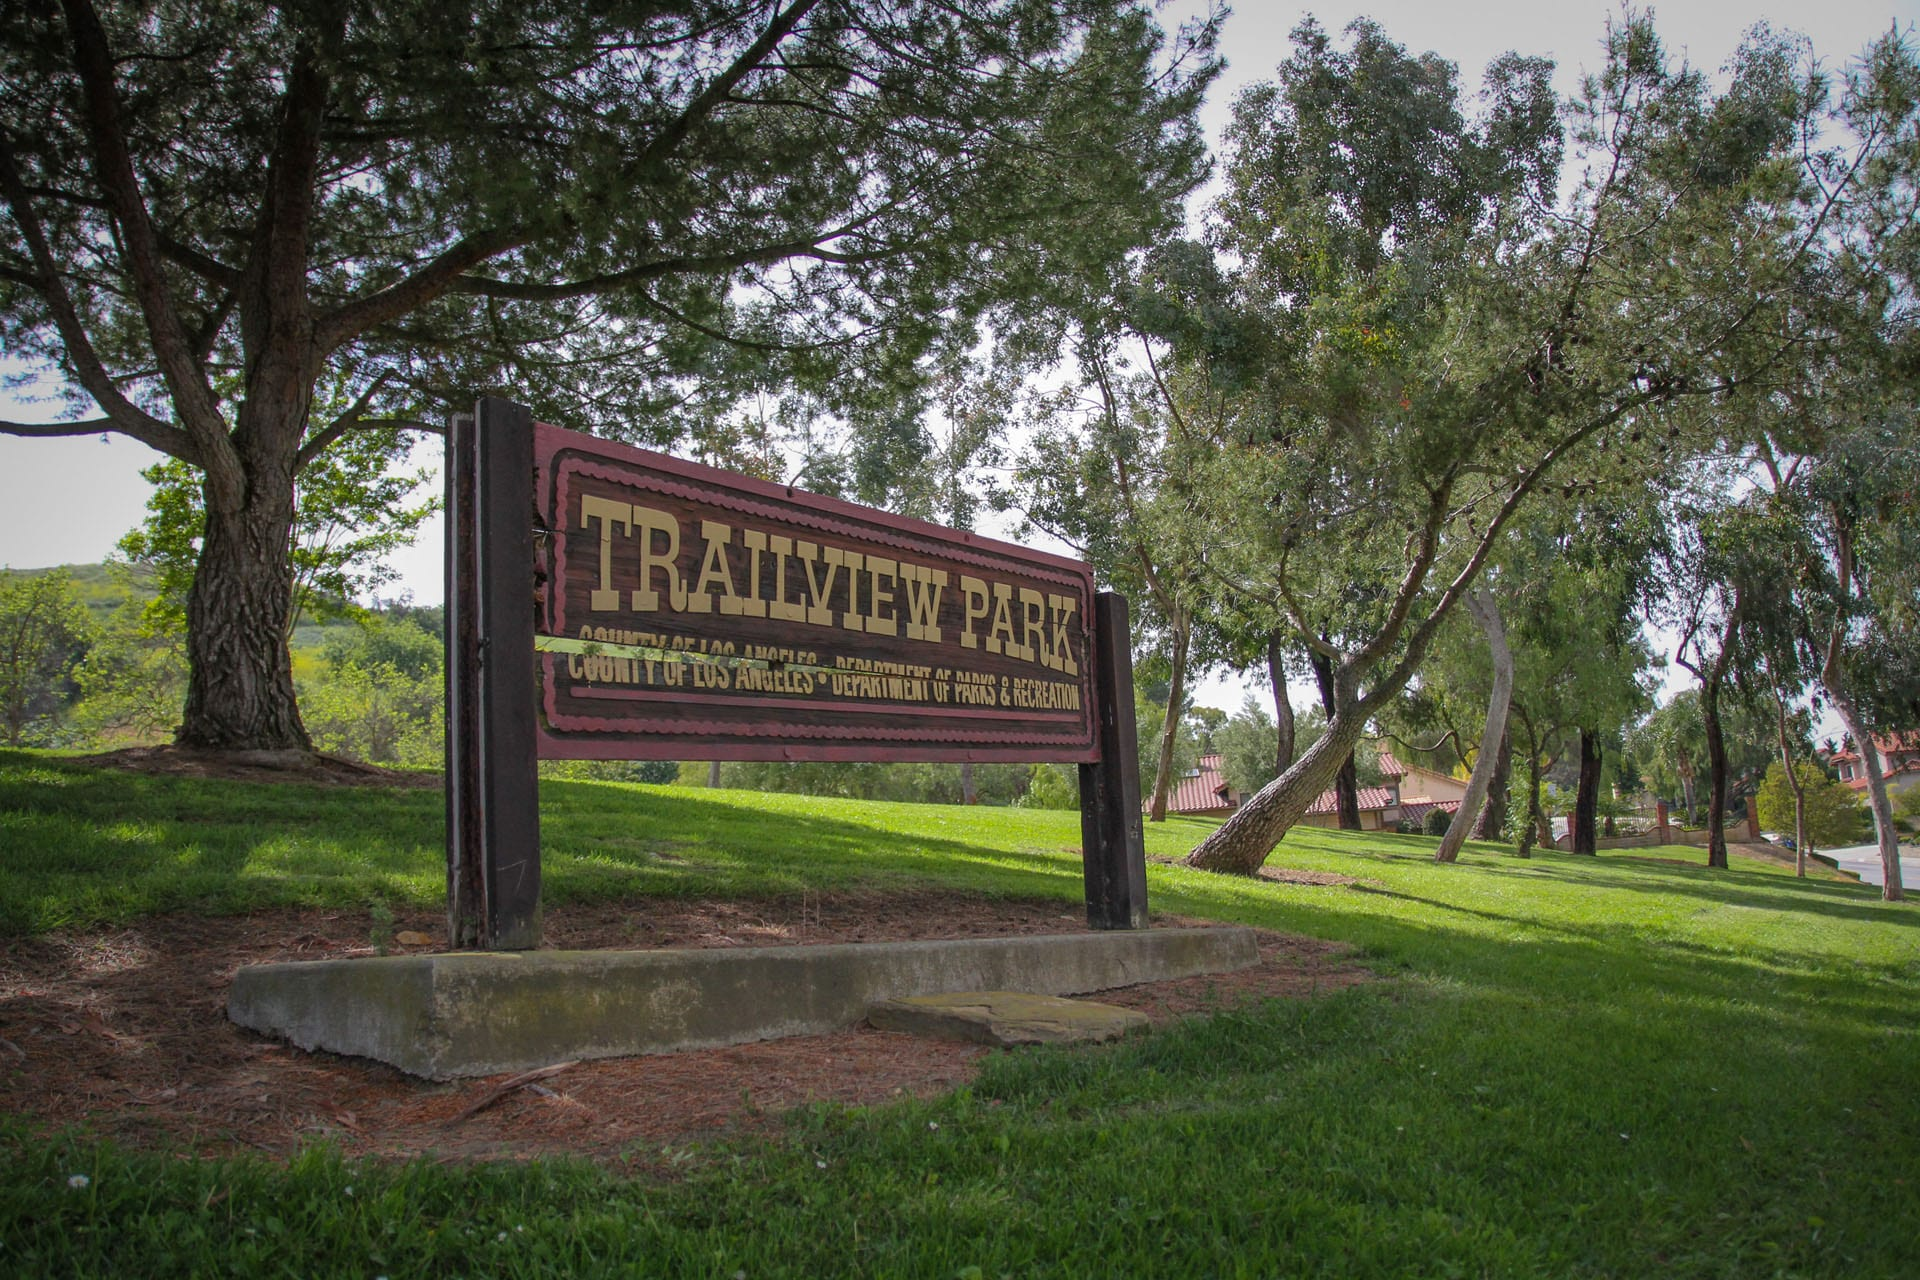 Trailview Park sign up close